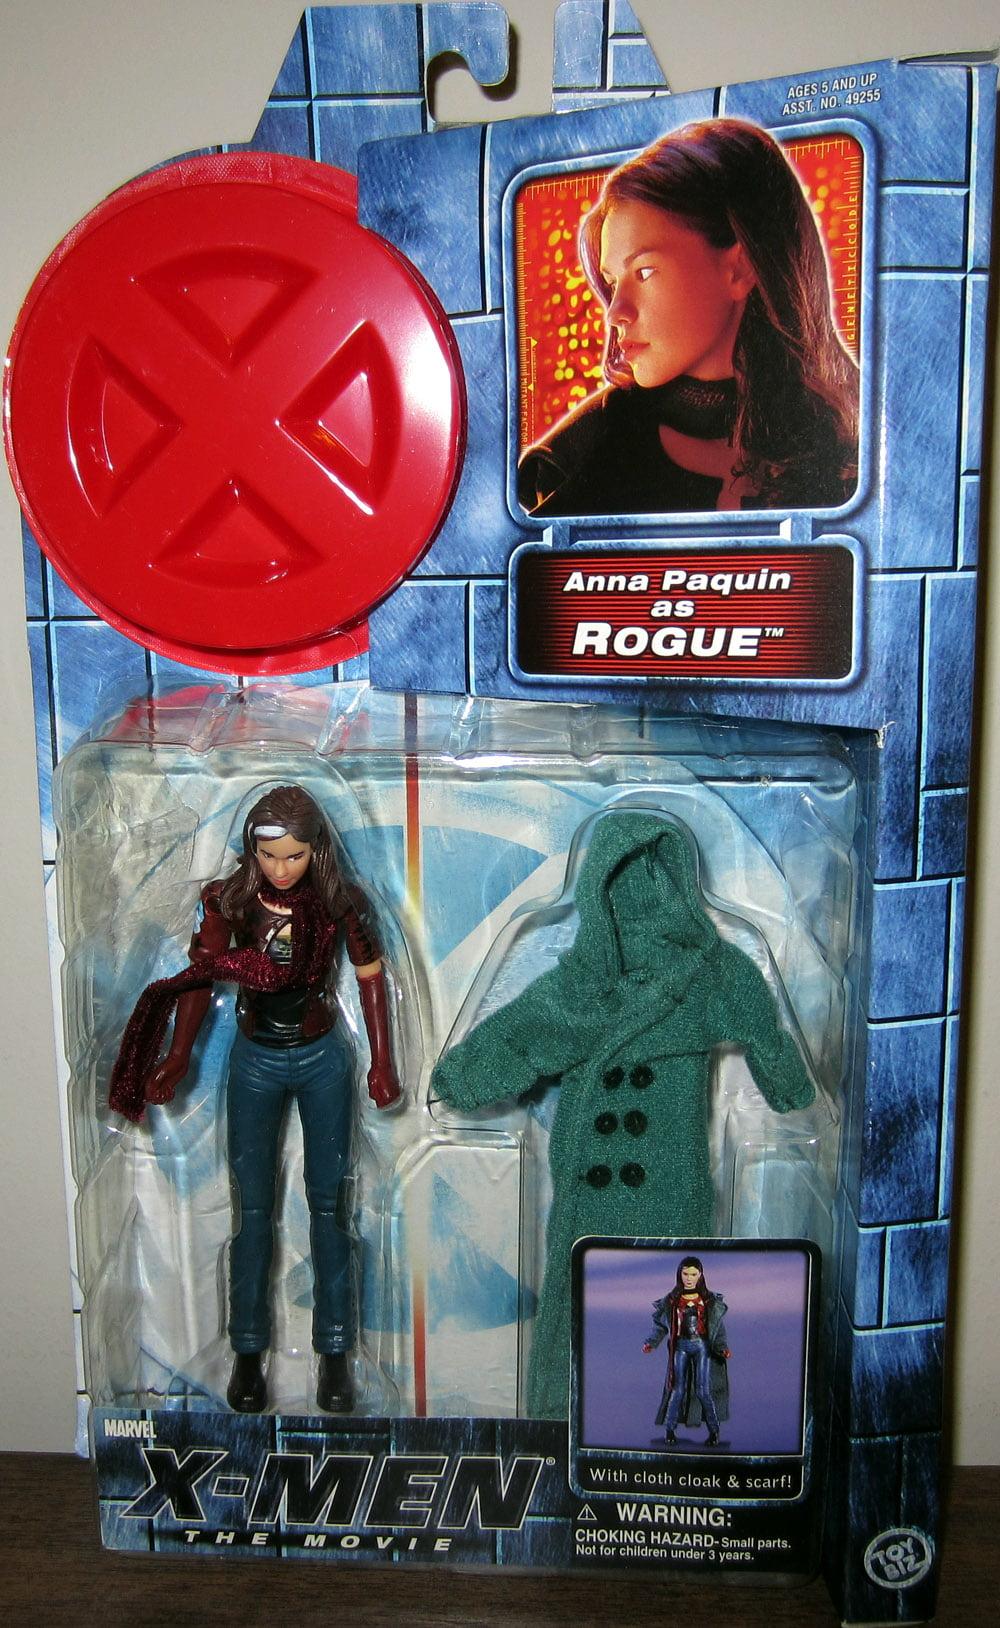 X-Men Movie Rogue Action Figure Anna Paquin by Toy Biz